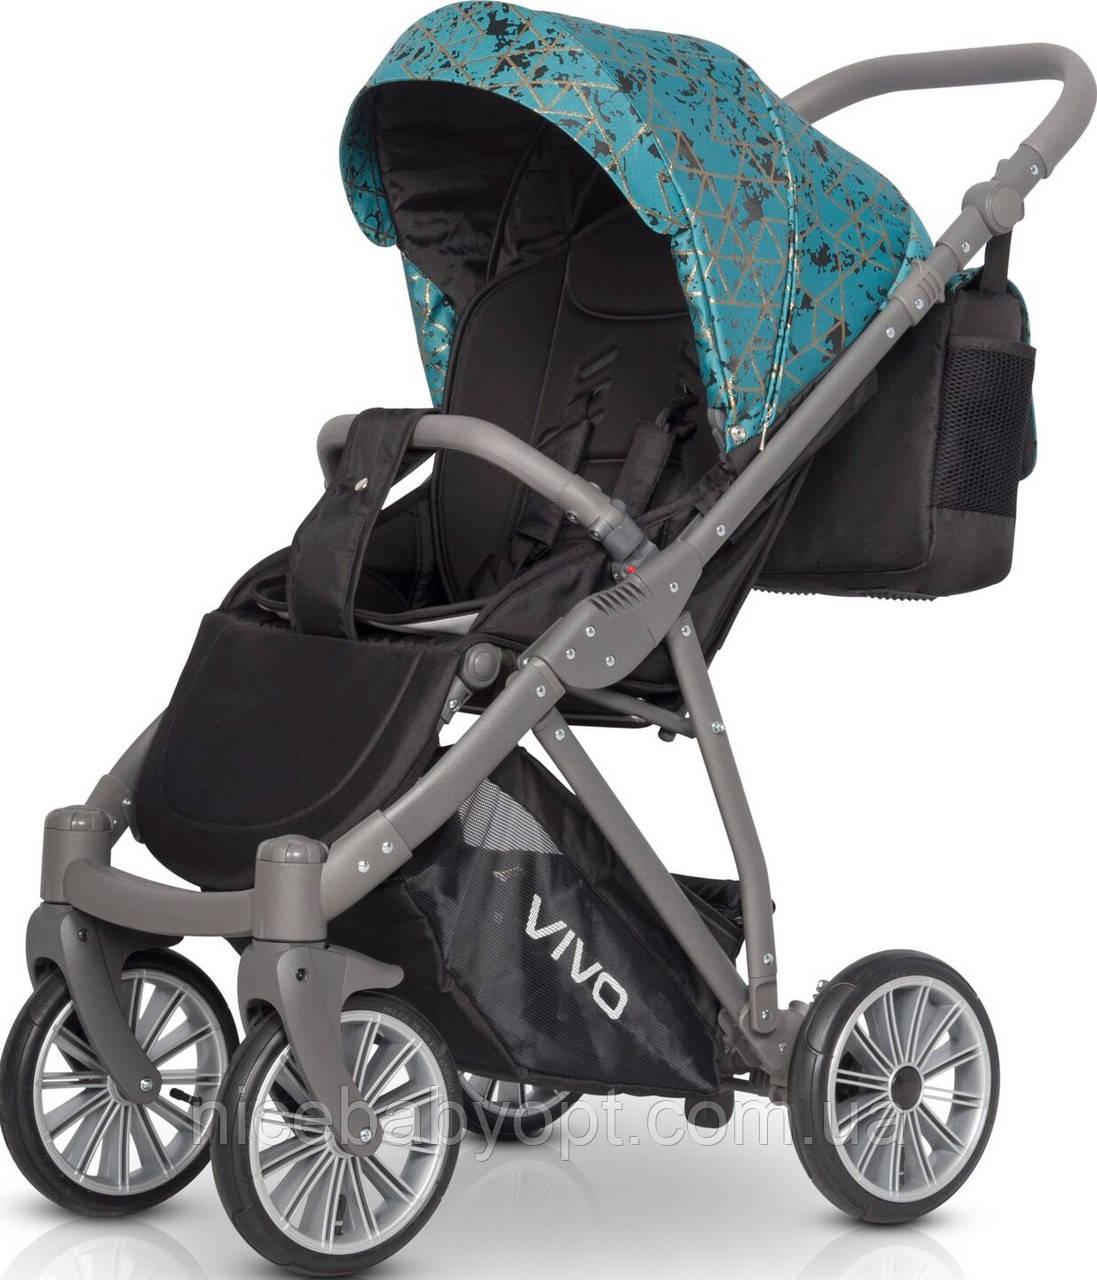 Детская  прогулочная коляска Riko Vivo 04